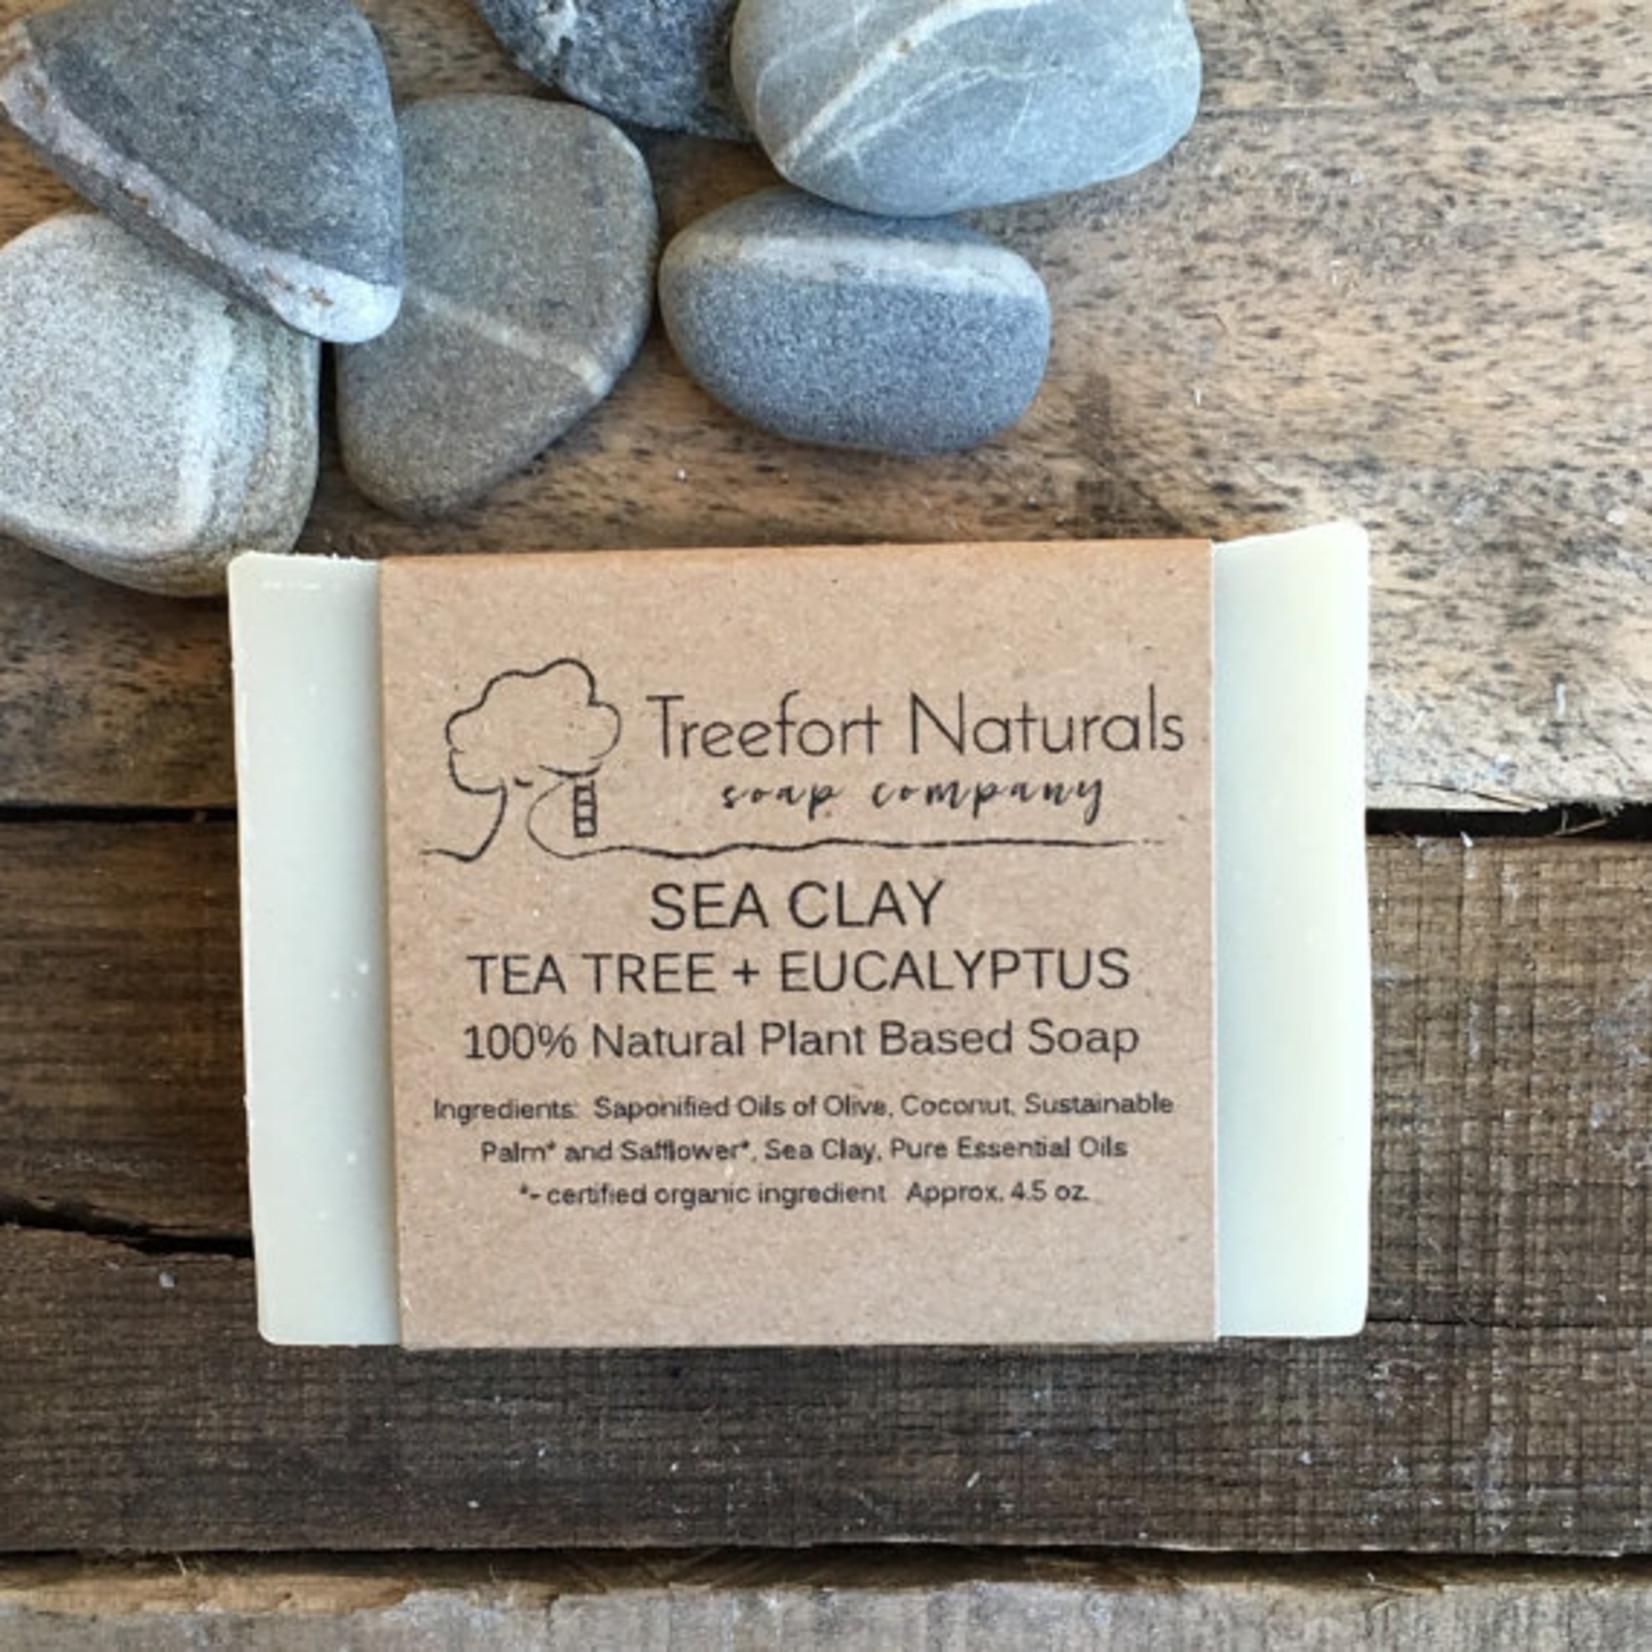 Treefort Naturals Treefort Naturals Sea Clay with Lemon Eucalyptus Soap